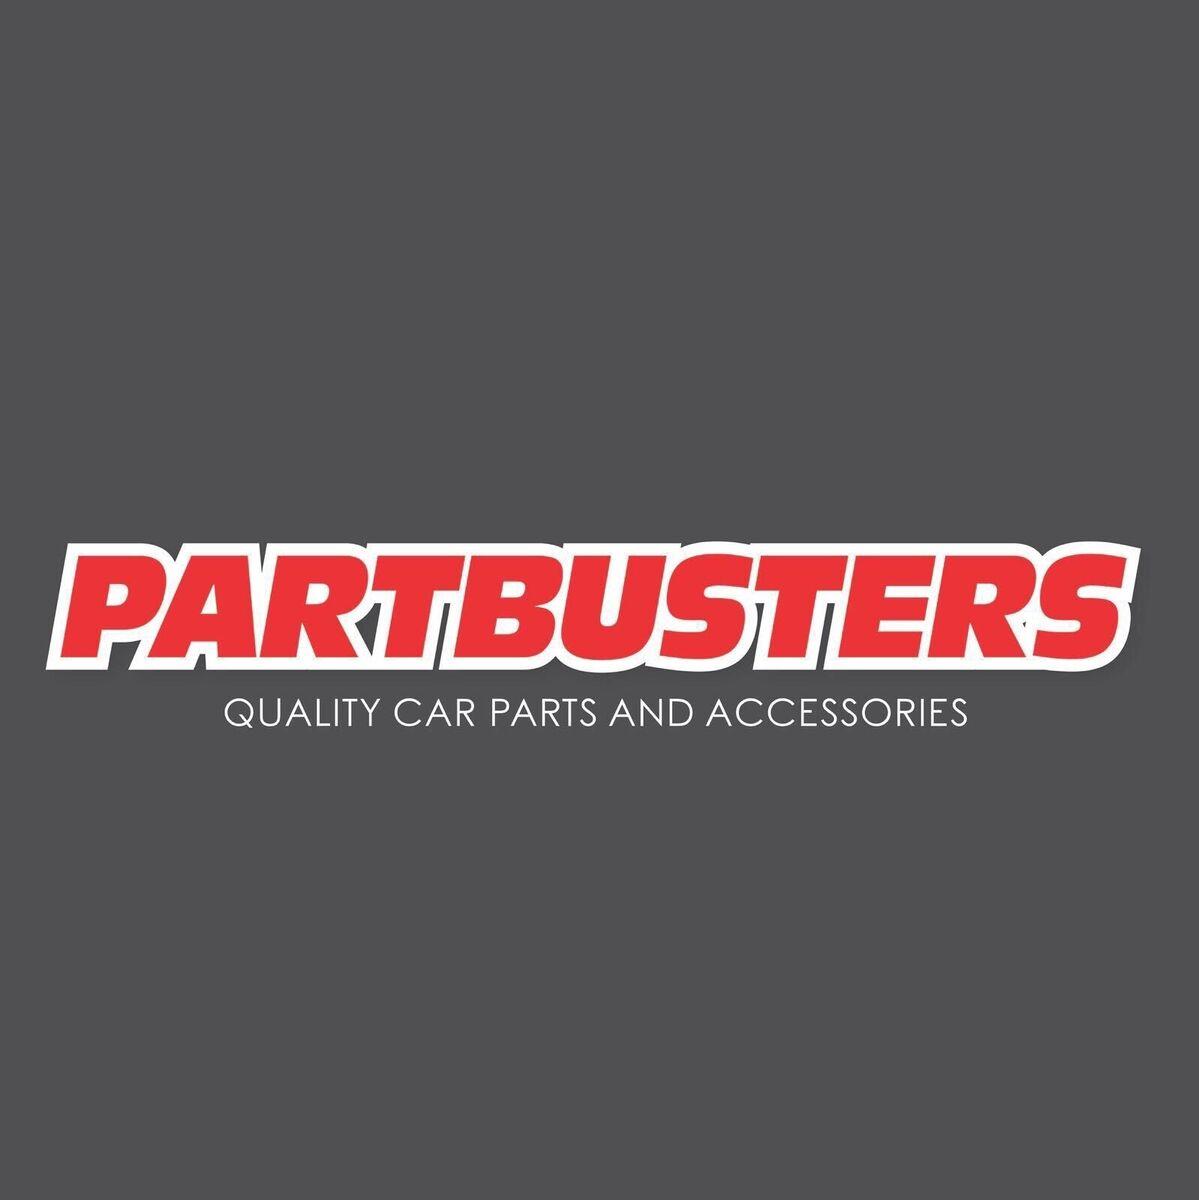 partbusters